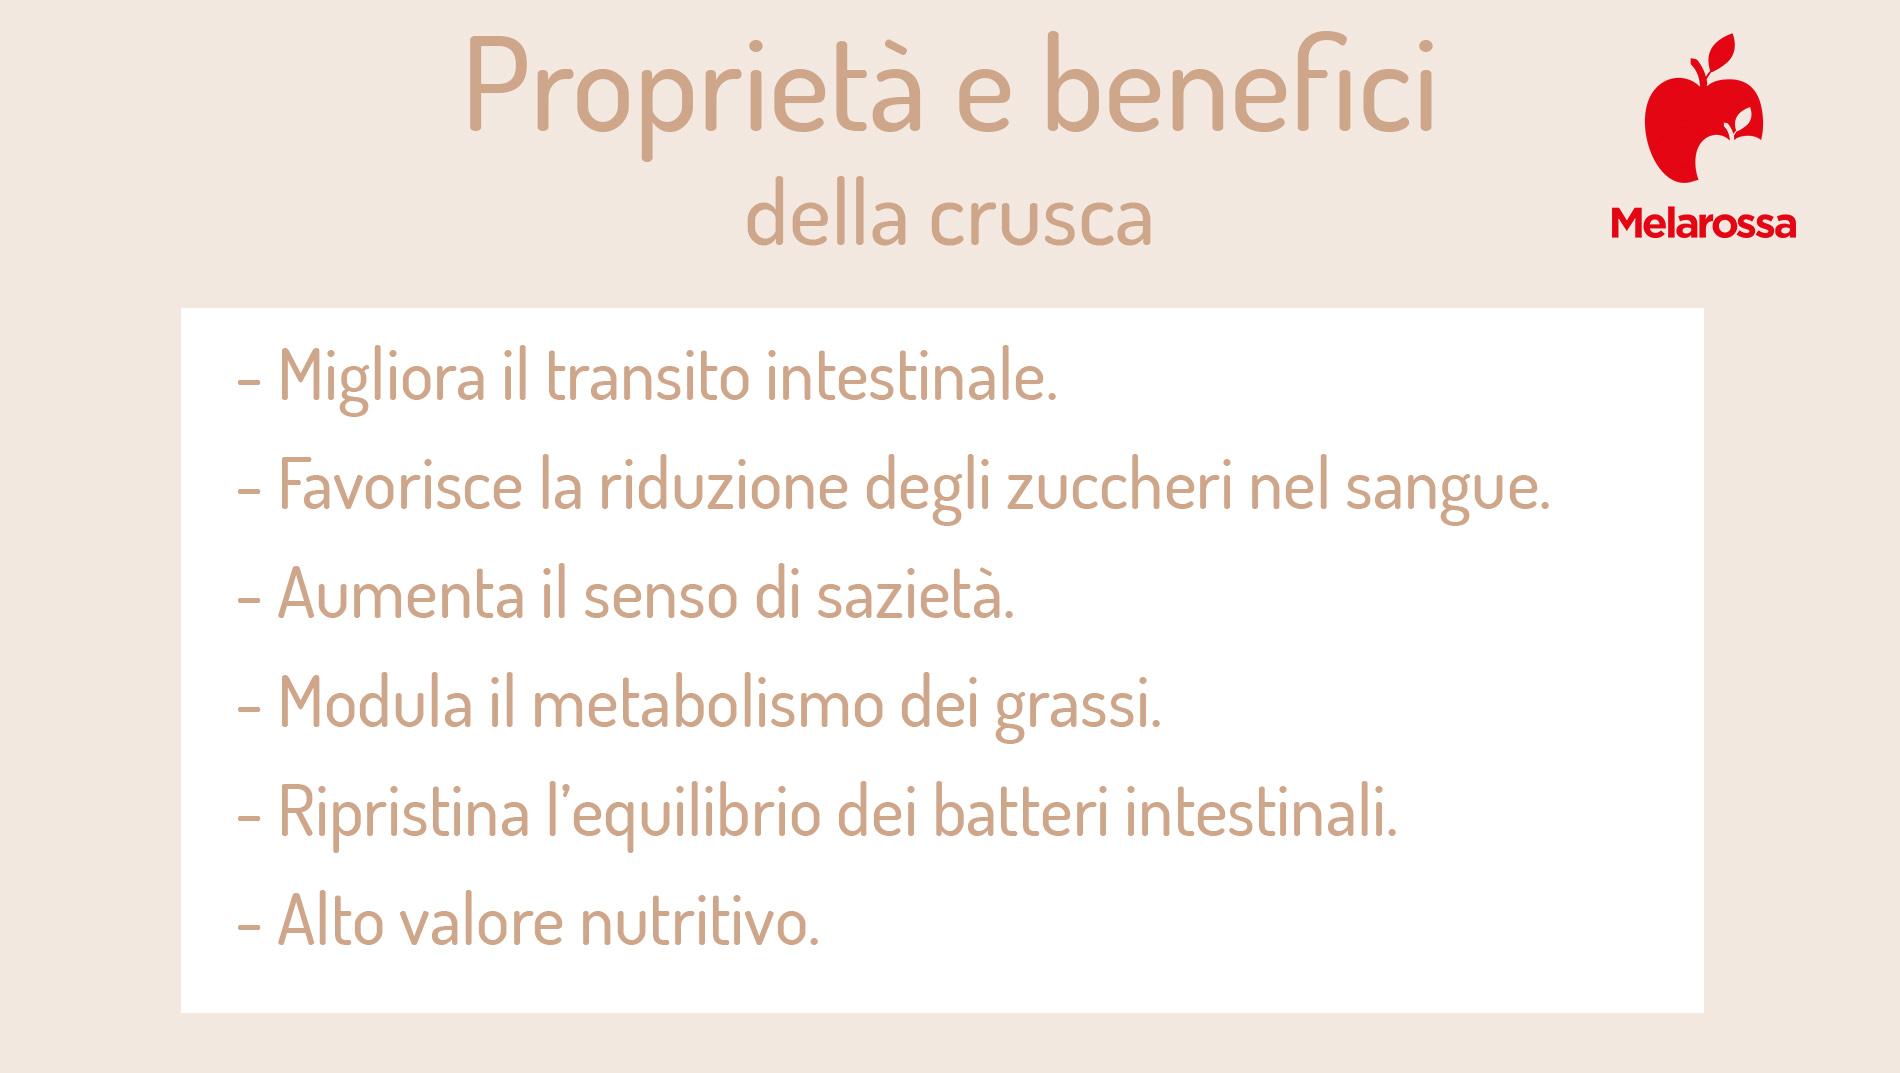 crusca: proprietà e benefici